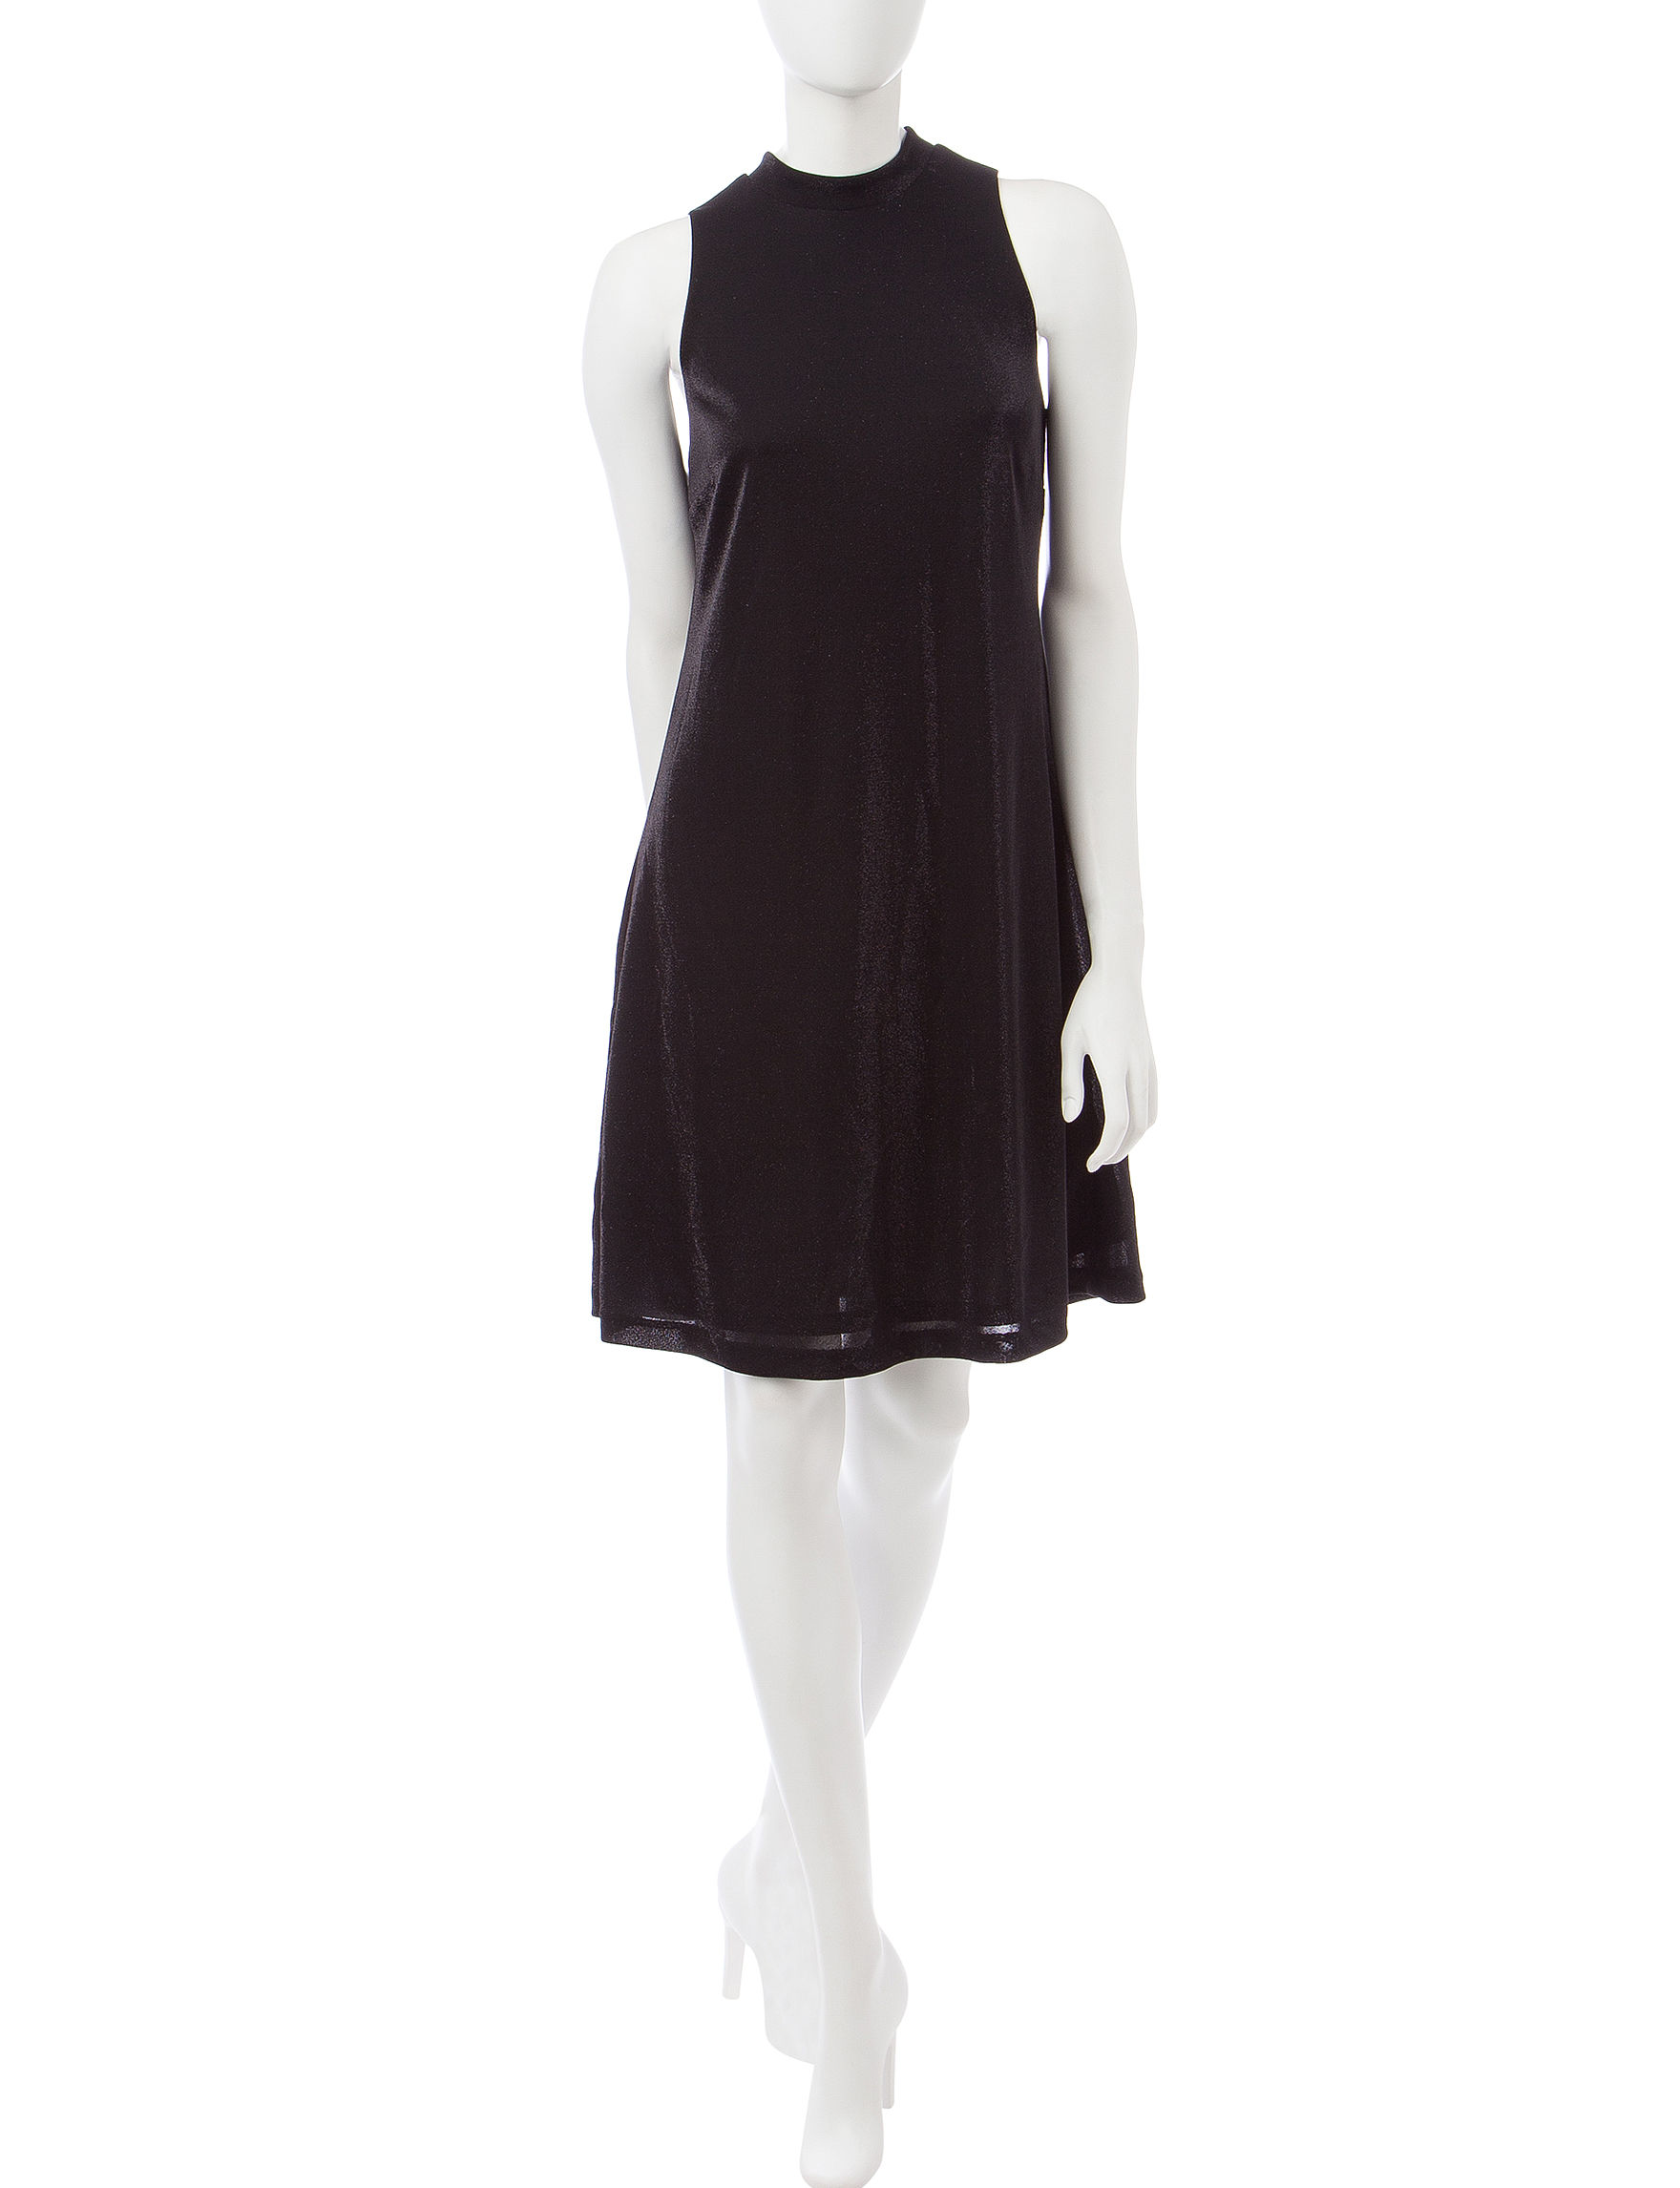 Nine West Black Everyday & Casual A-line Dresses Fit & Flare Dresses